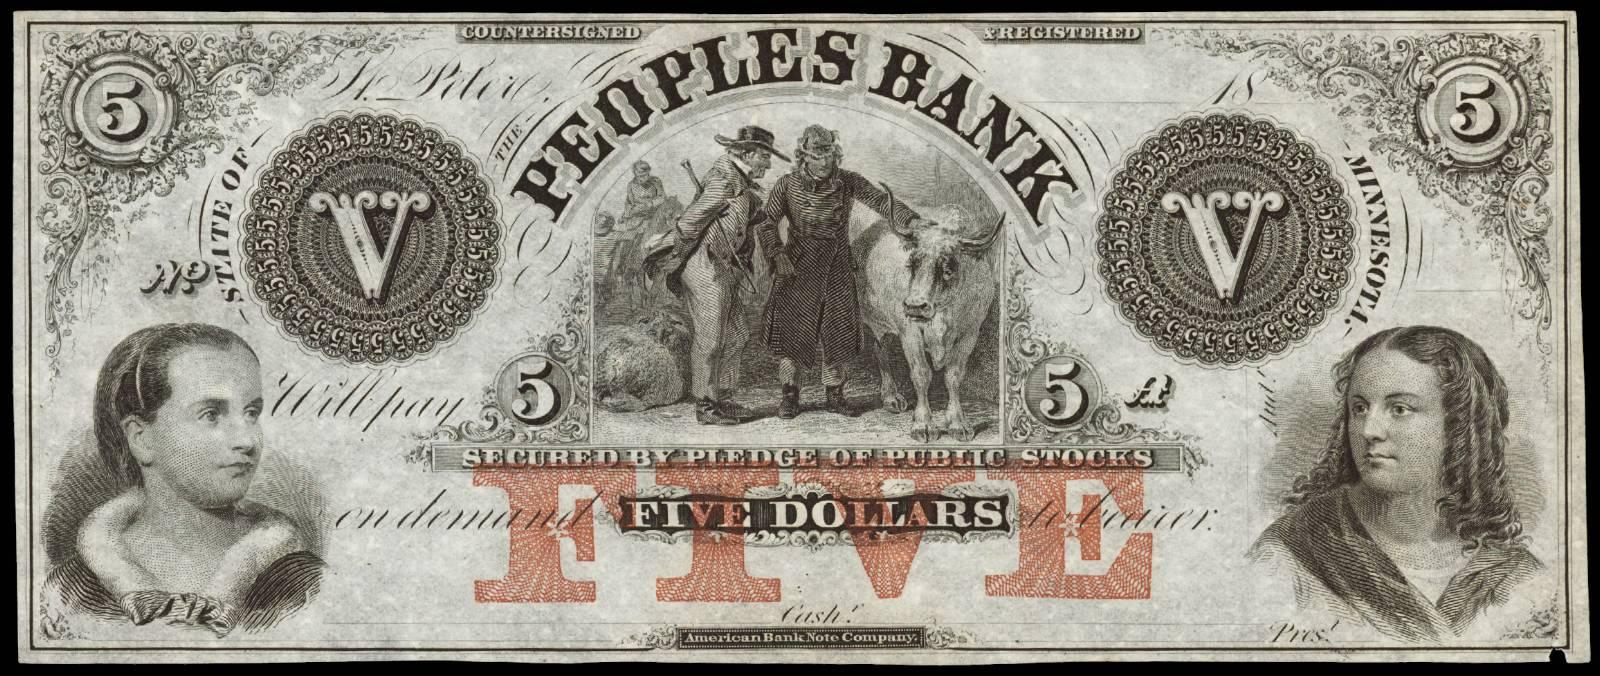 $5 Peoples Bank